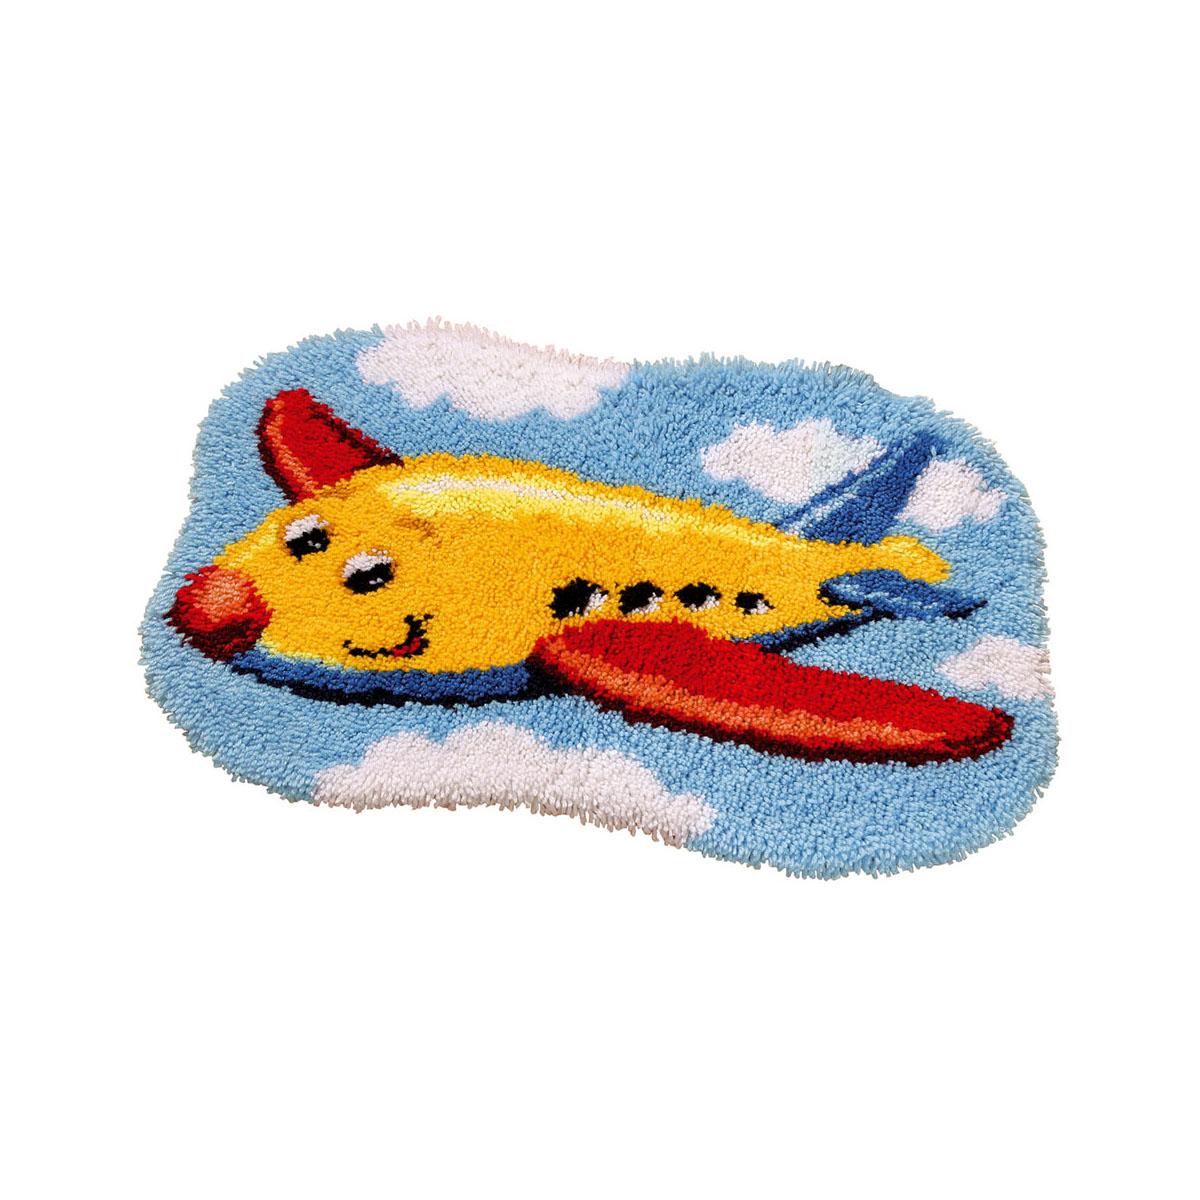 0014369-PN Коврик (ковровая техника) Vervaco 'Самолет' 70x50 см